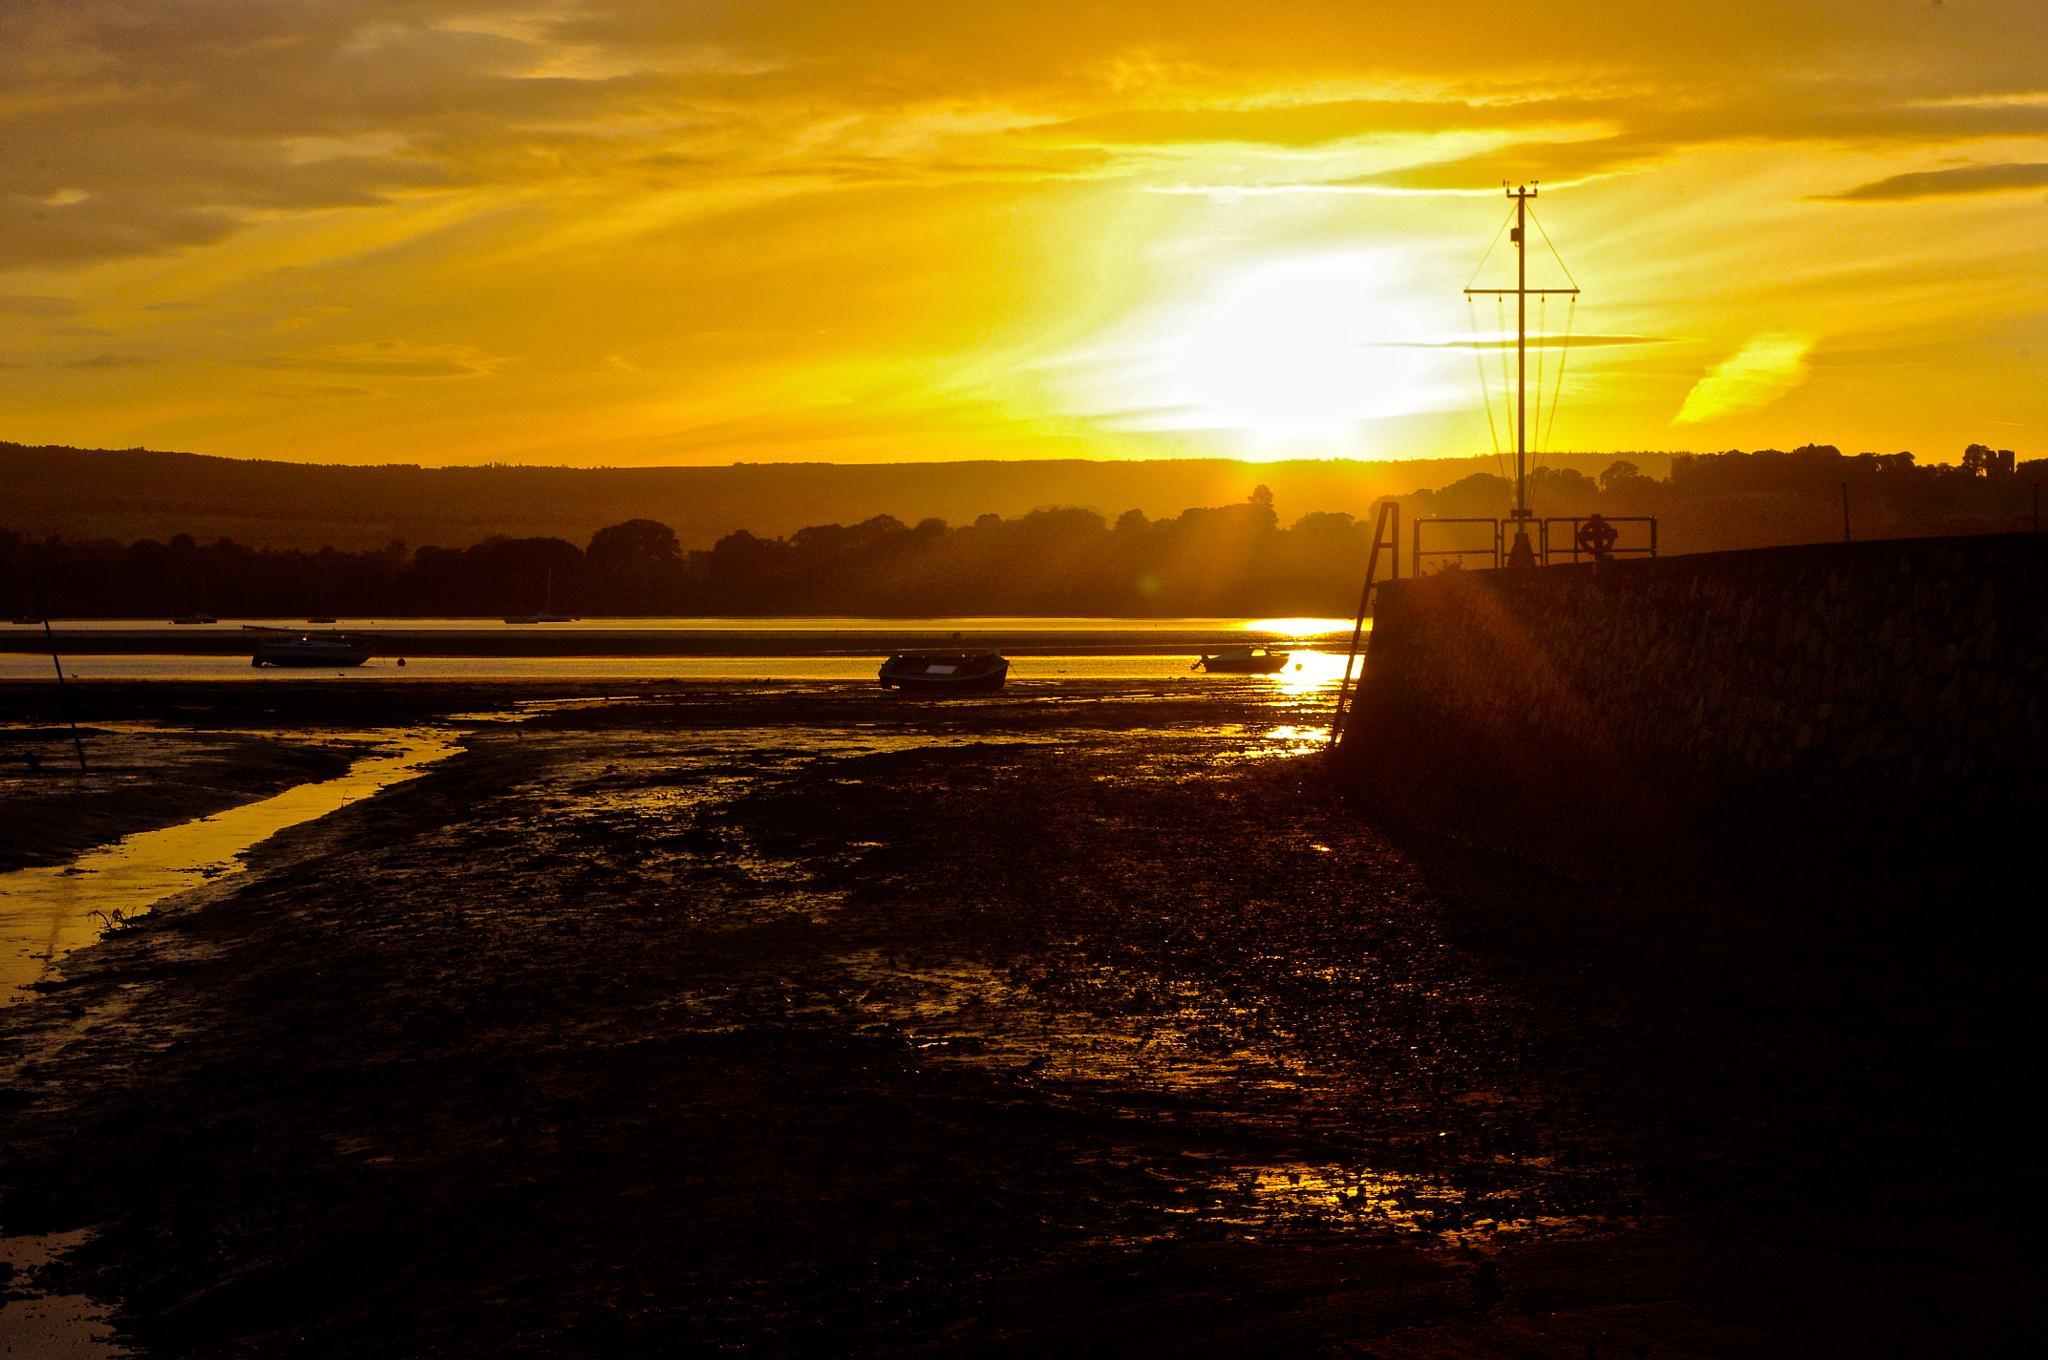 lympstone sunset by tom salt